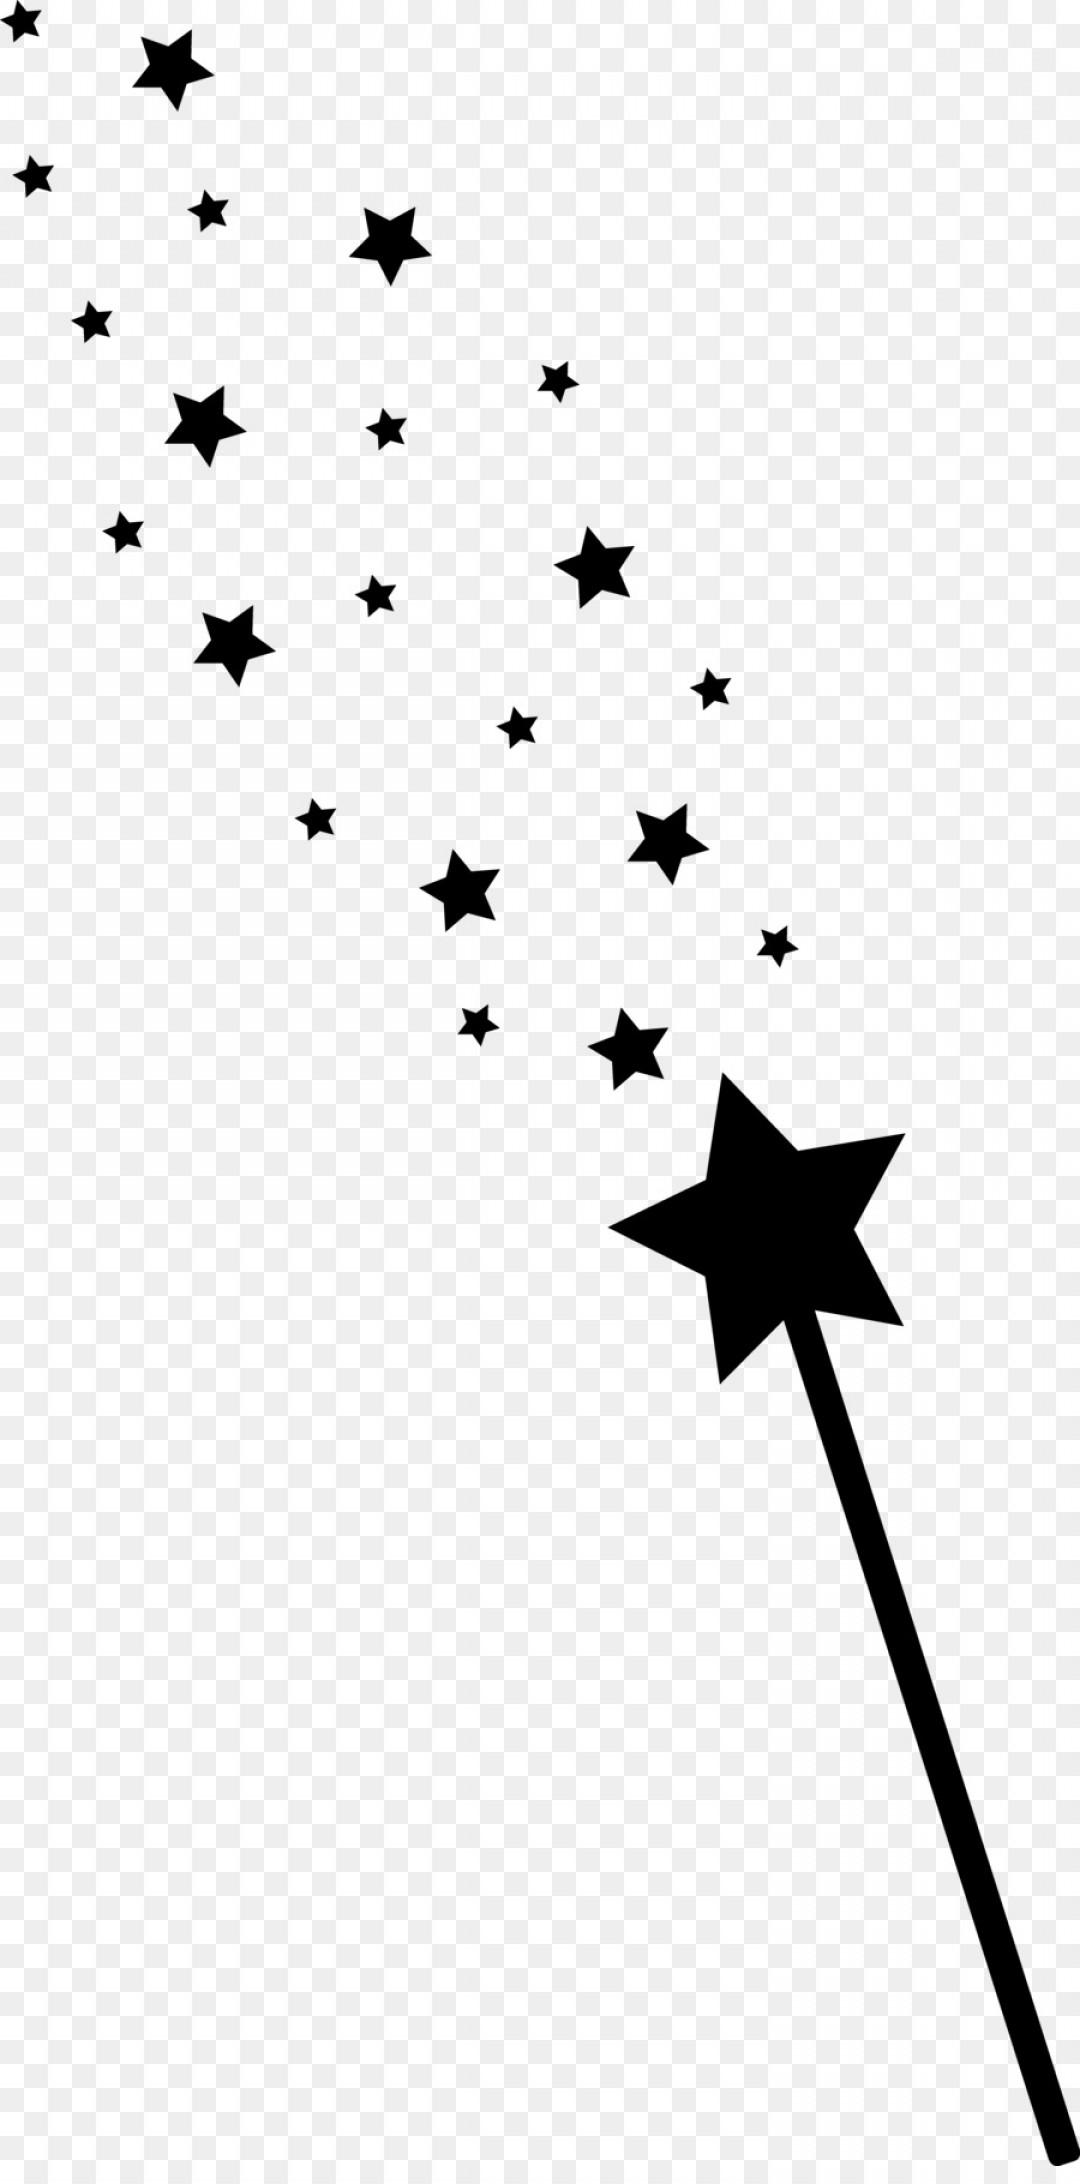 Png Wand Fairy Magic Clip Art Stars Silhouette.